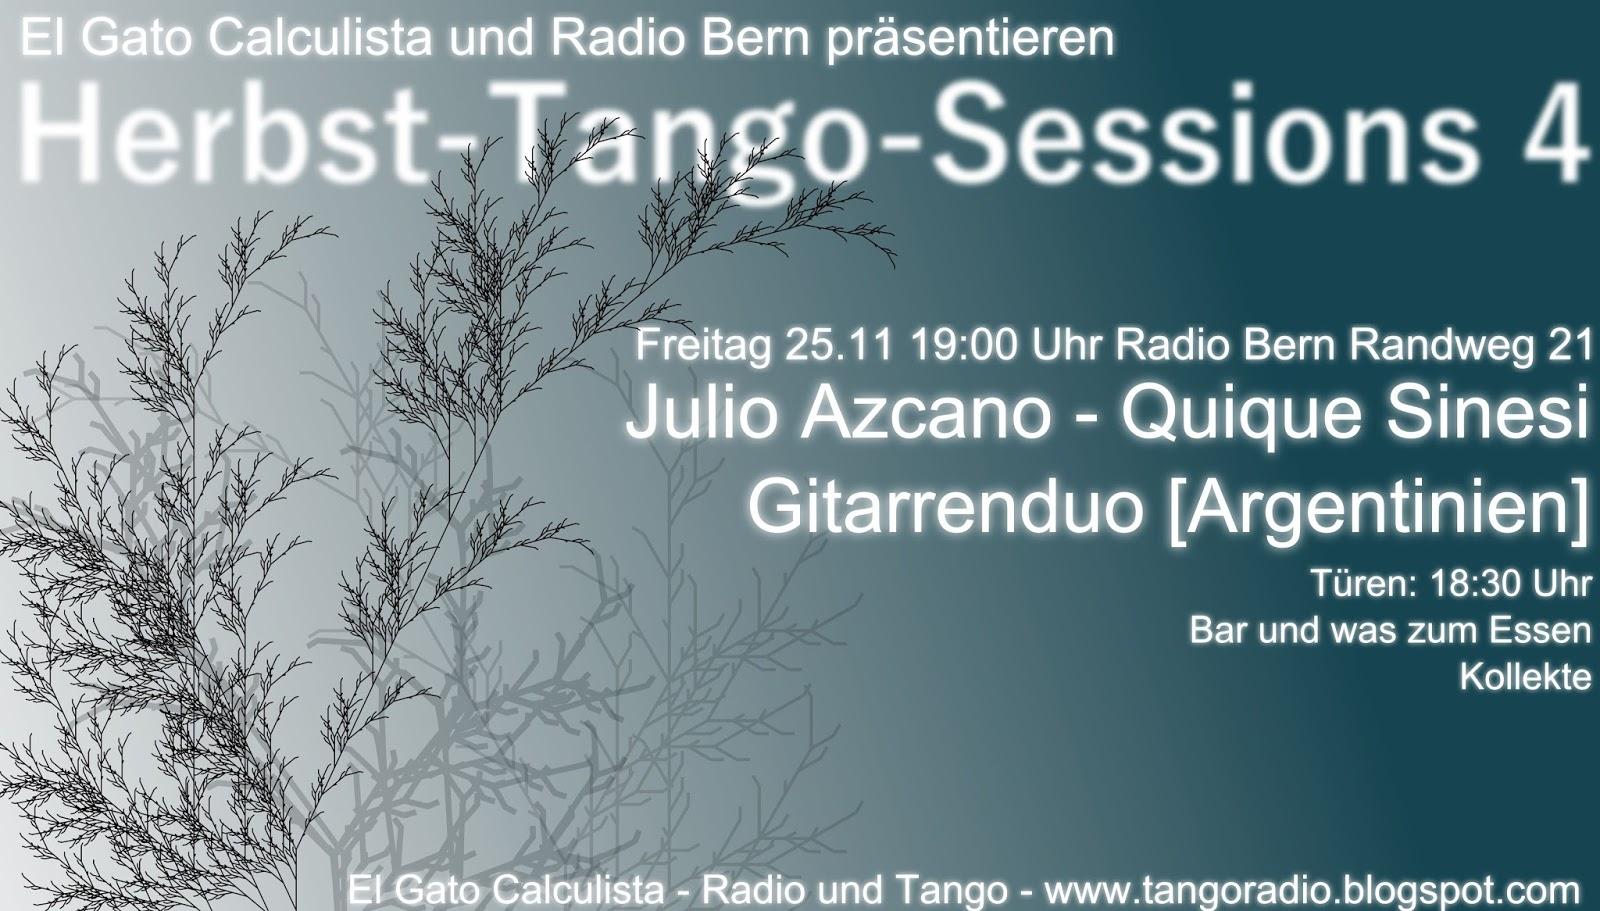 25112016 Herbst Studio Sessions La Ltima